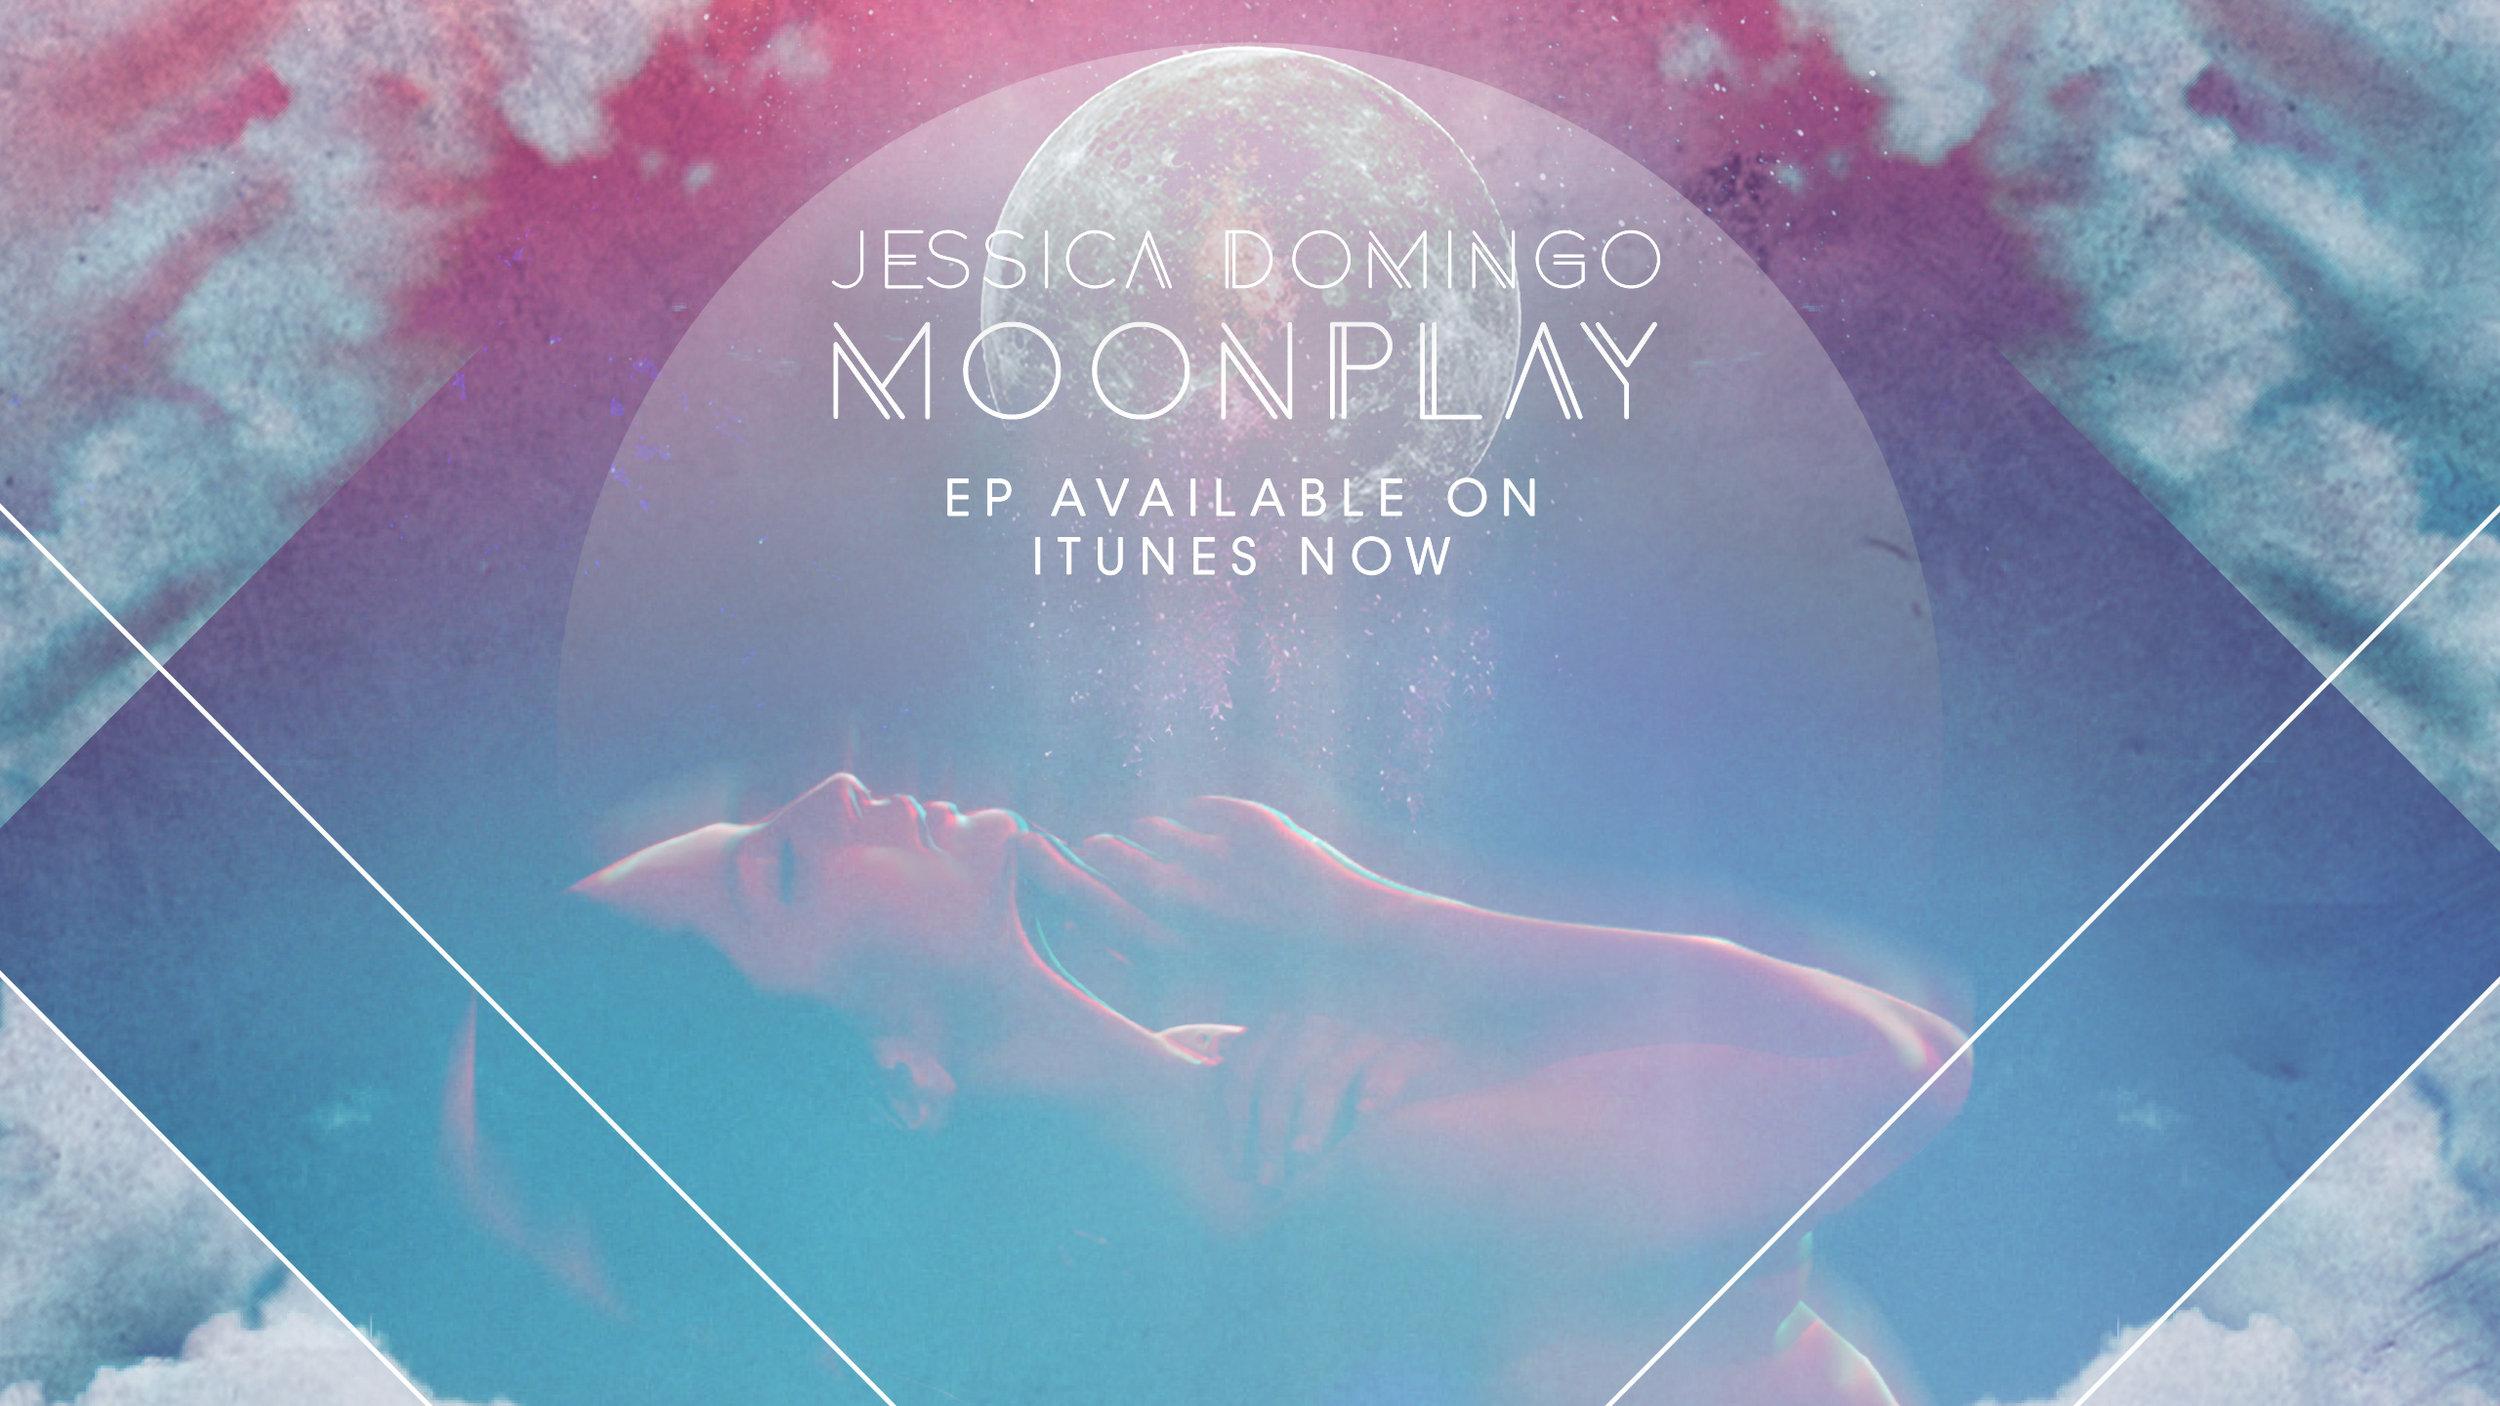 Moonplay-youtube-2560x1440.jpg